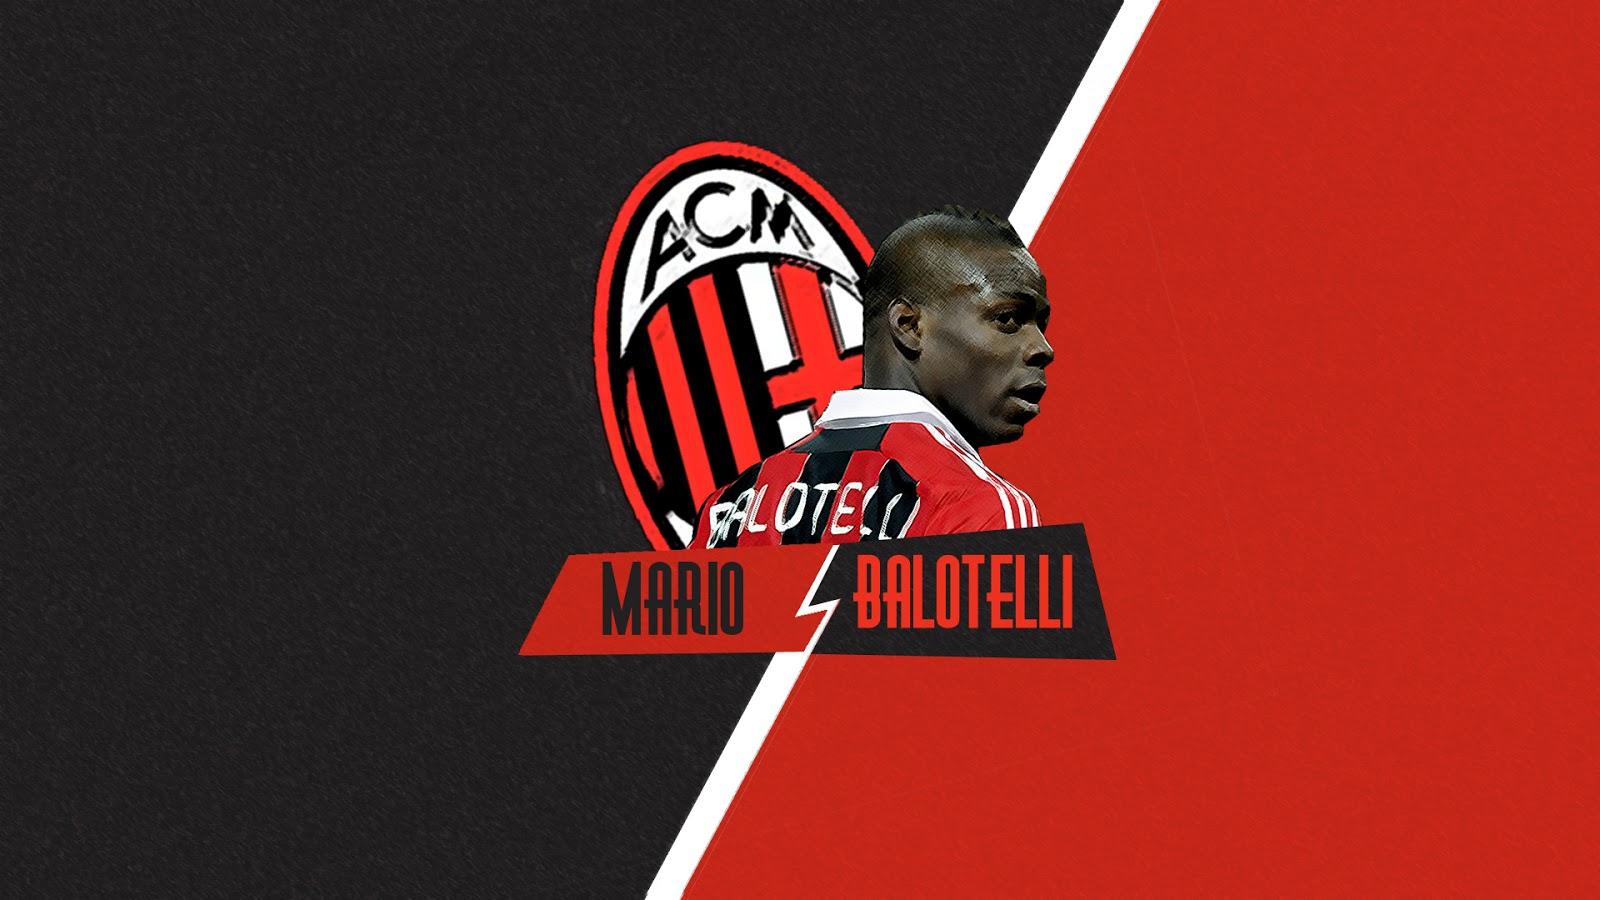 AC Milan Wallpaper   Mario Balotelli 2014 HD Wallpaper for Desktop 1600x900